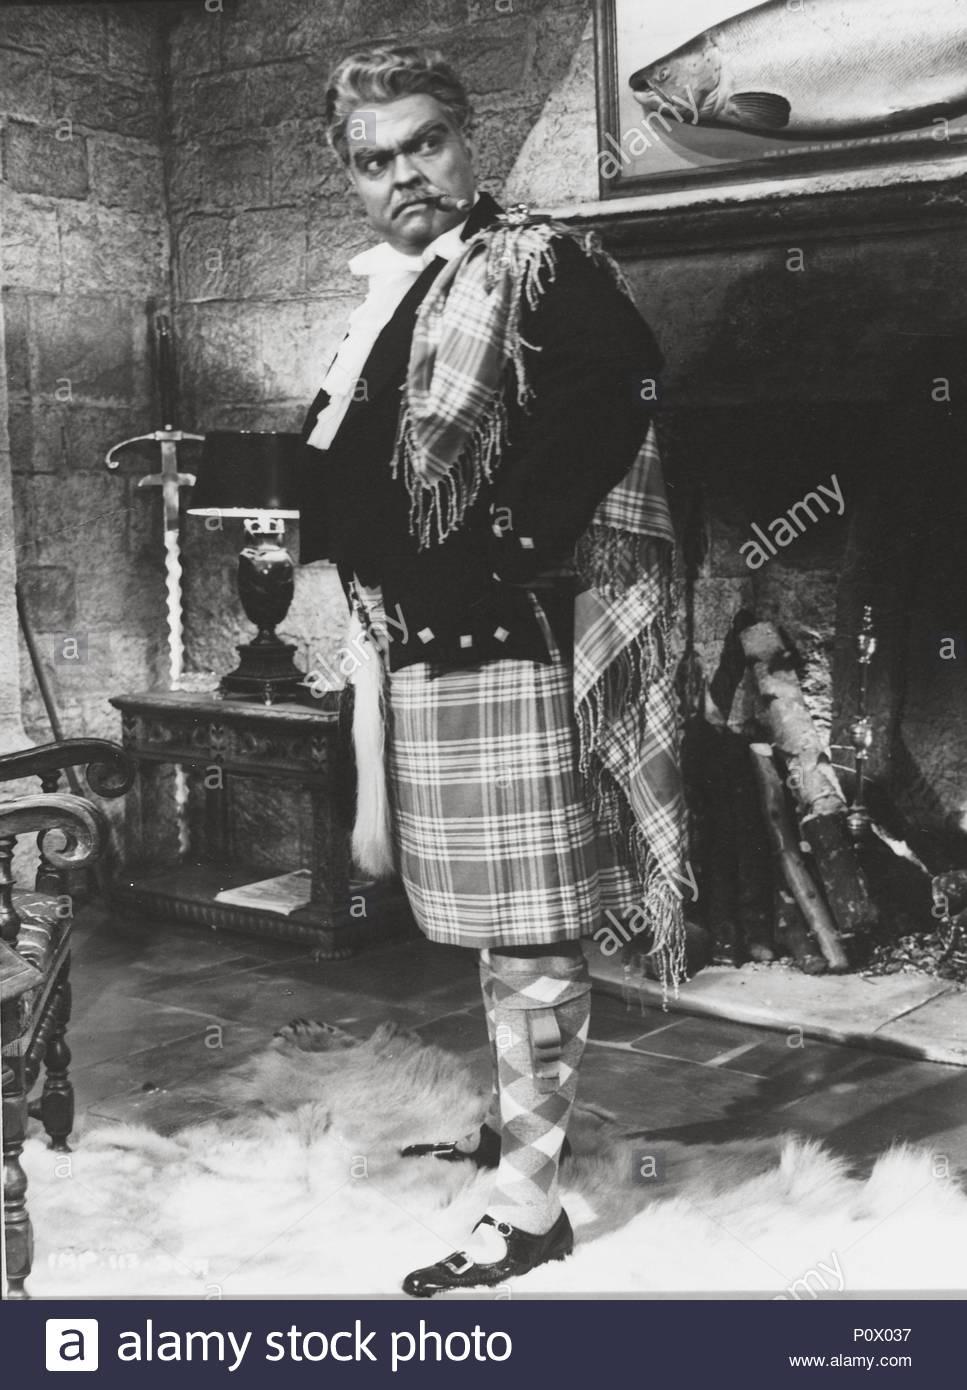 Original Film Title: TROUBLE IN THE GLEN.  English Title: TROUBLE IN THE GLEN.  Film Director: HERBERT WILCOX.  Year: 1954.  Stars: ORSON WELLES. Credit: REPUBLIC PICTURES / Album - Stock Image